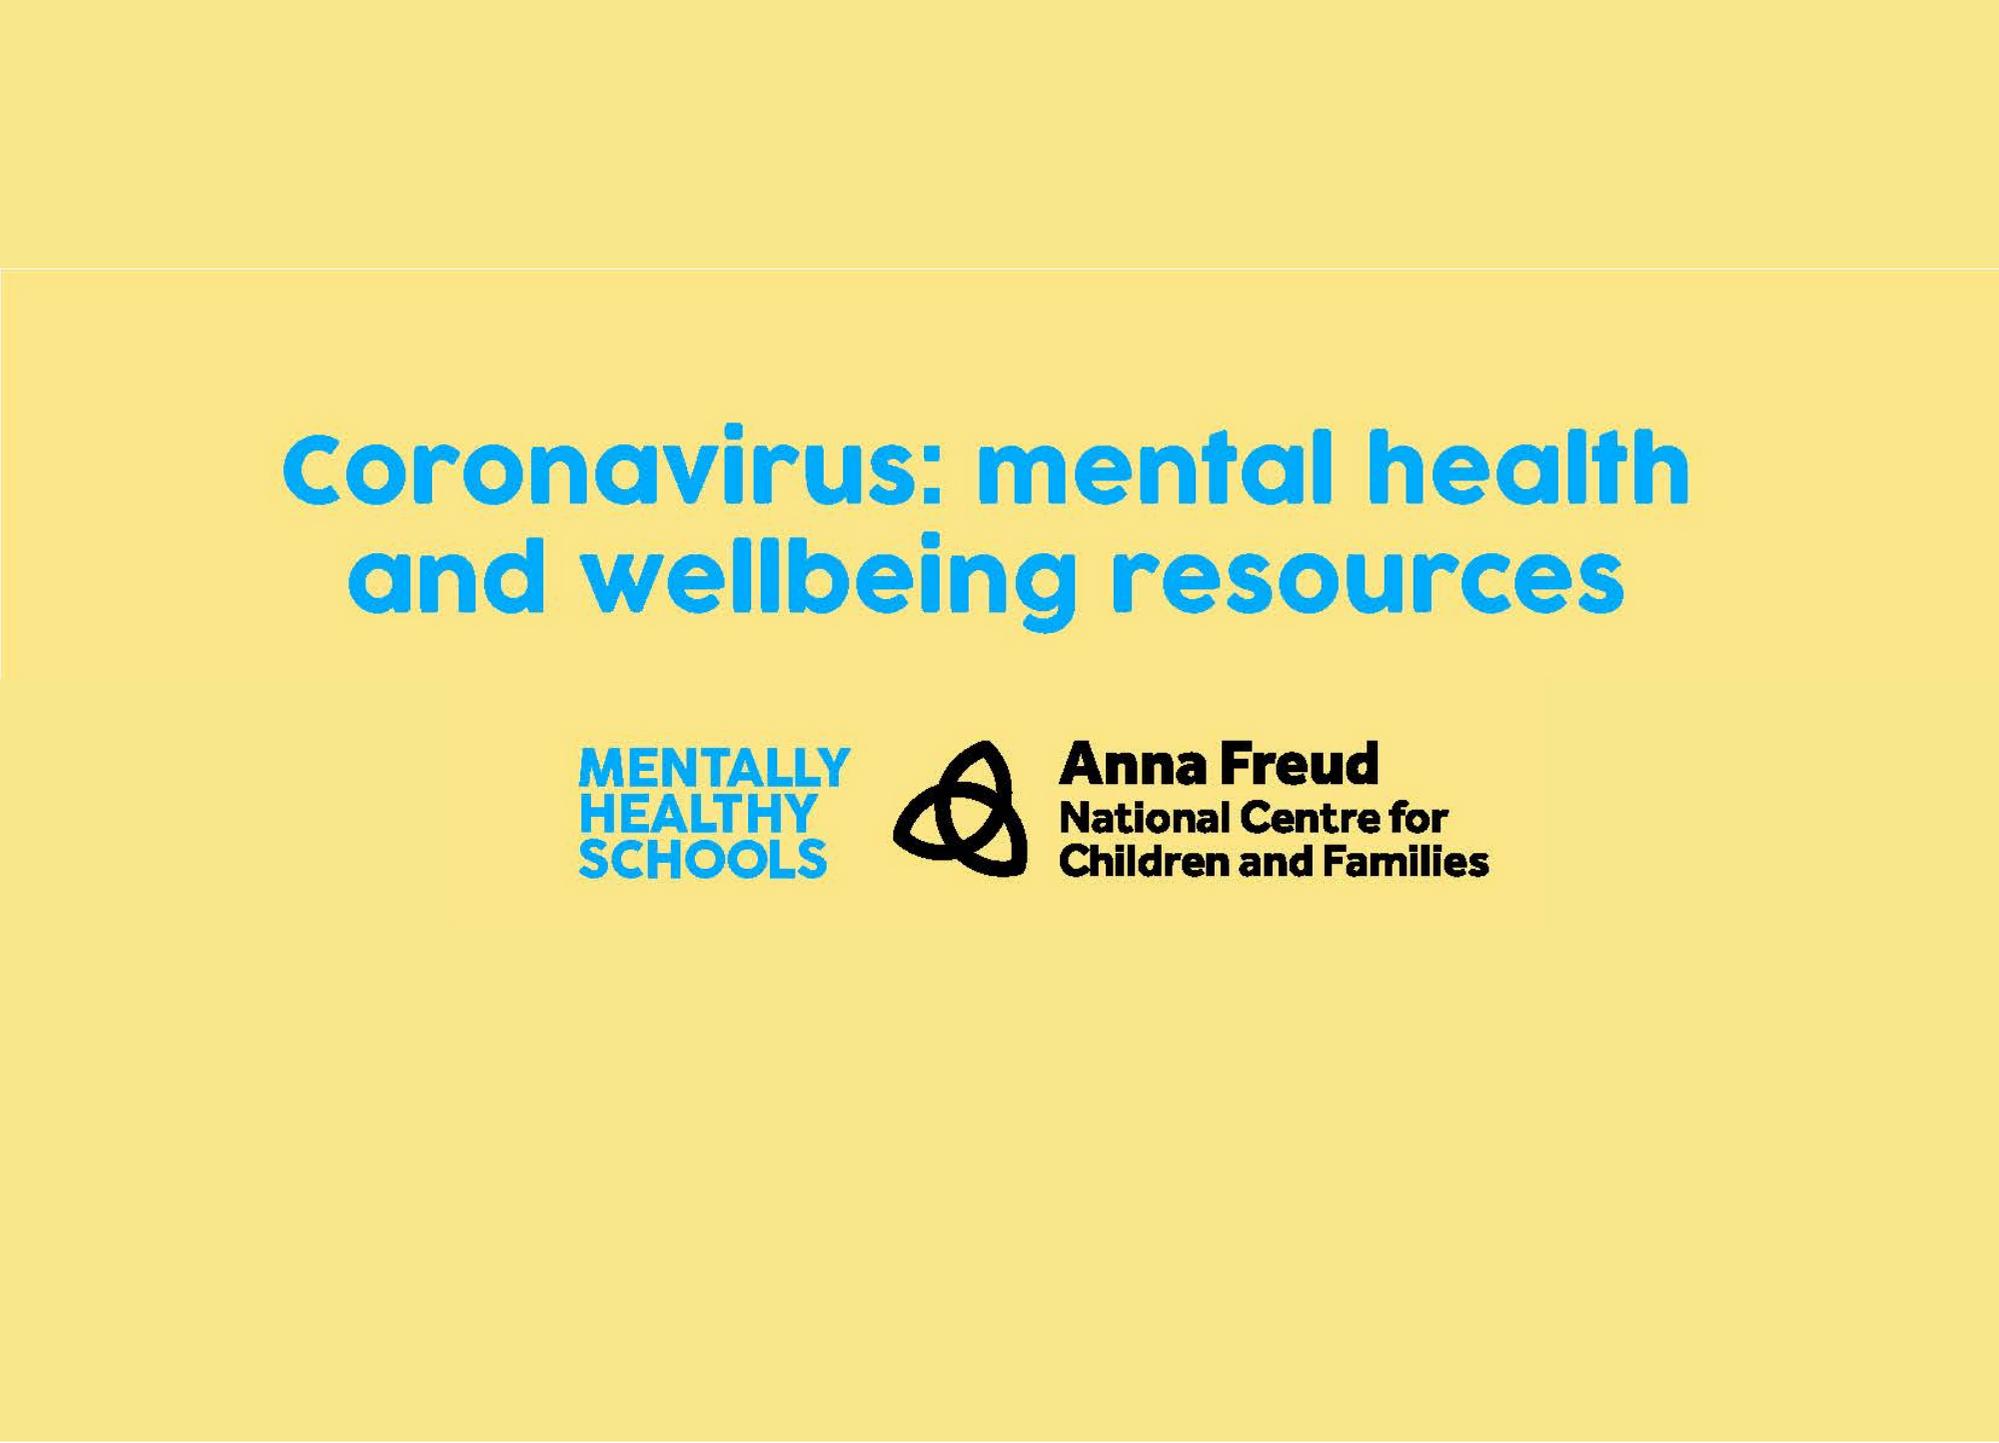 Coronavirus mental health and wellbeing resources